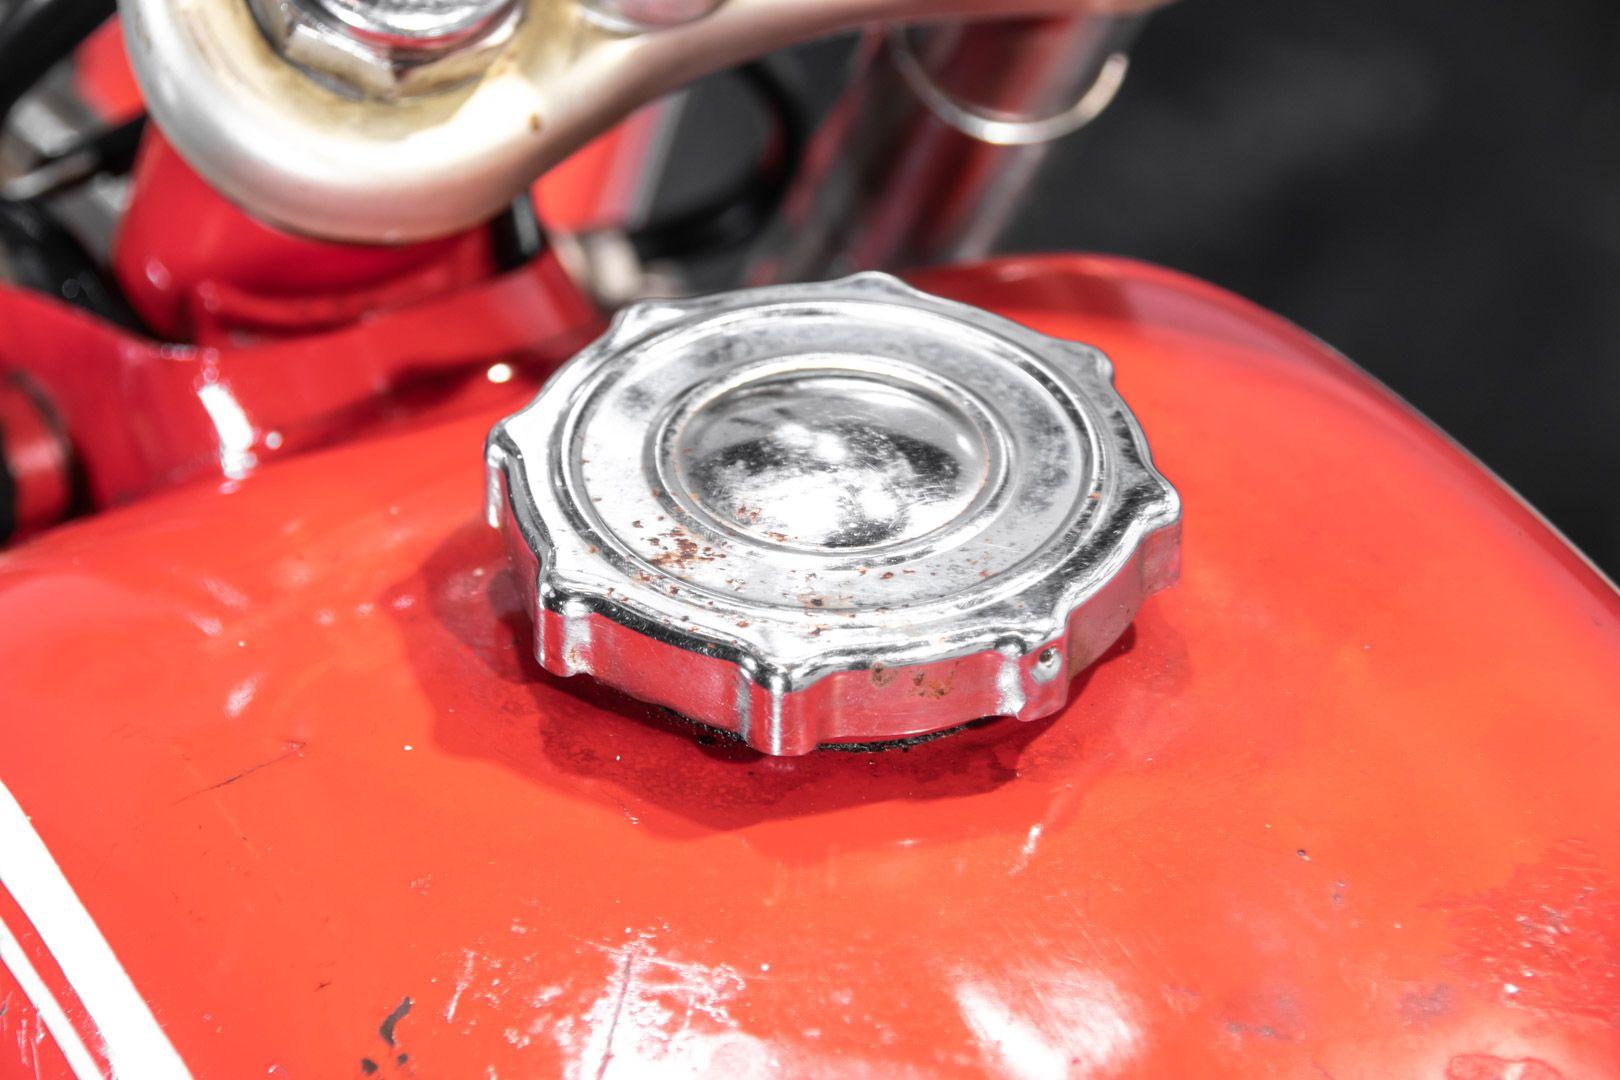 1978 Bonvicini Moto Jaguarino 50 82538